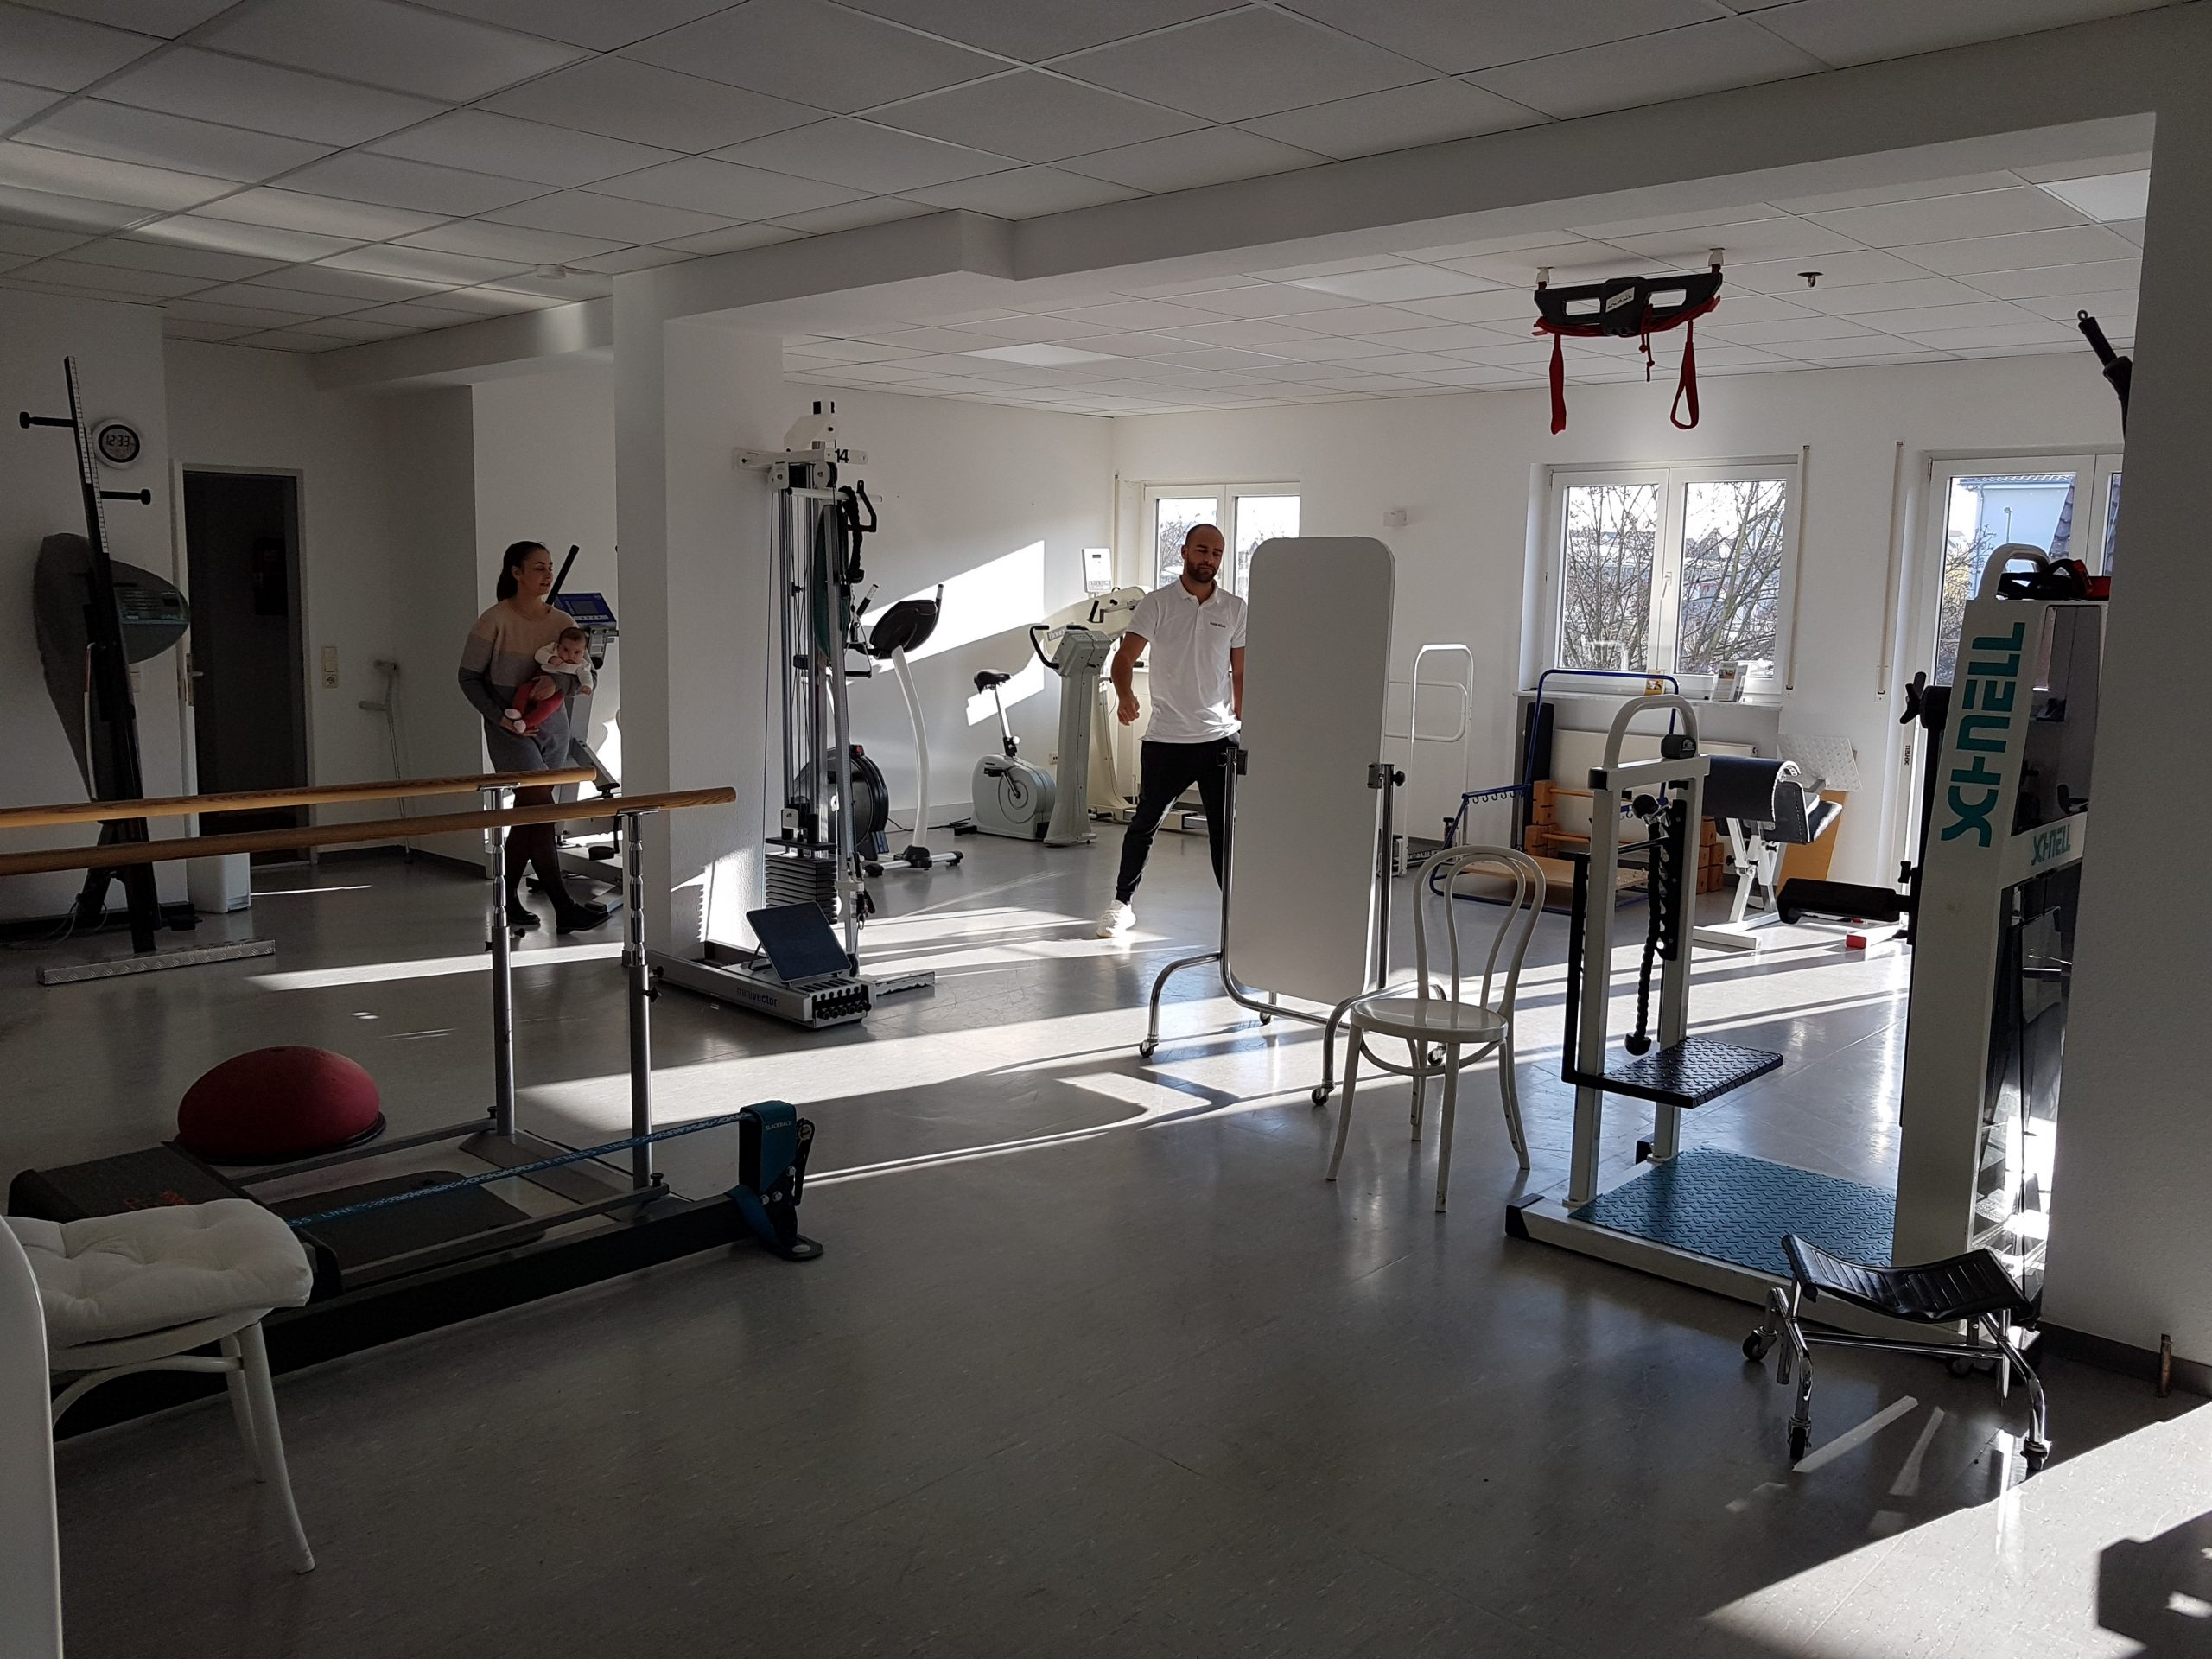 Standort - MAIN-REHA Ambulantes Therapie- und Rehazentrum